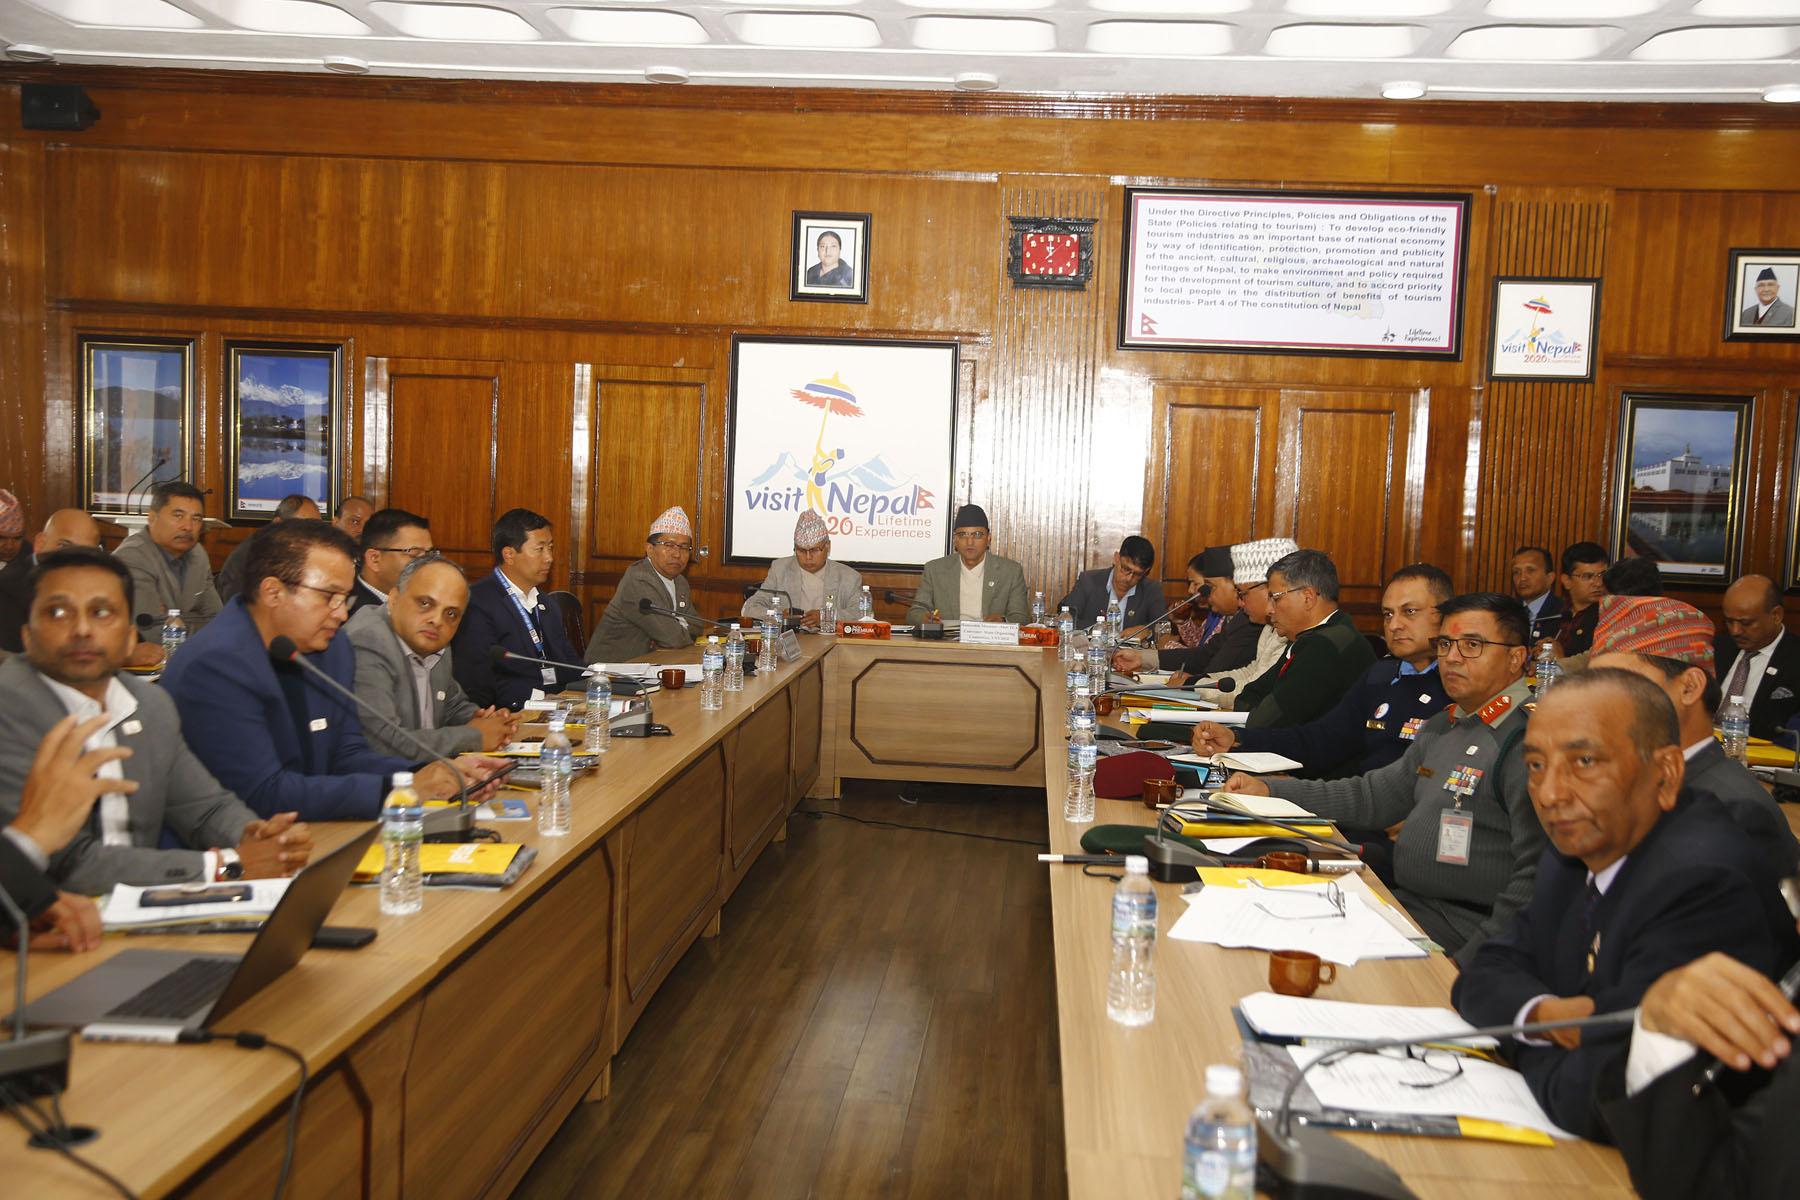 Fifth Meeting of VNY 2020 Main Programme Committee in Kathmandu